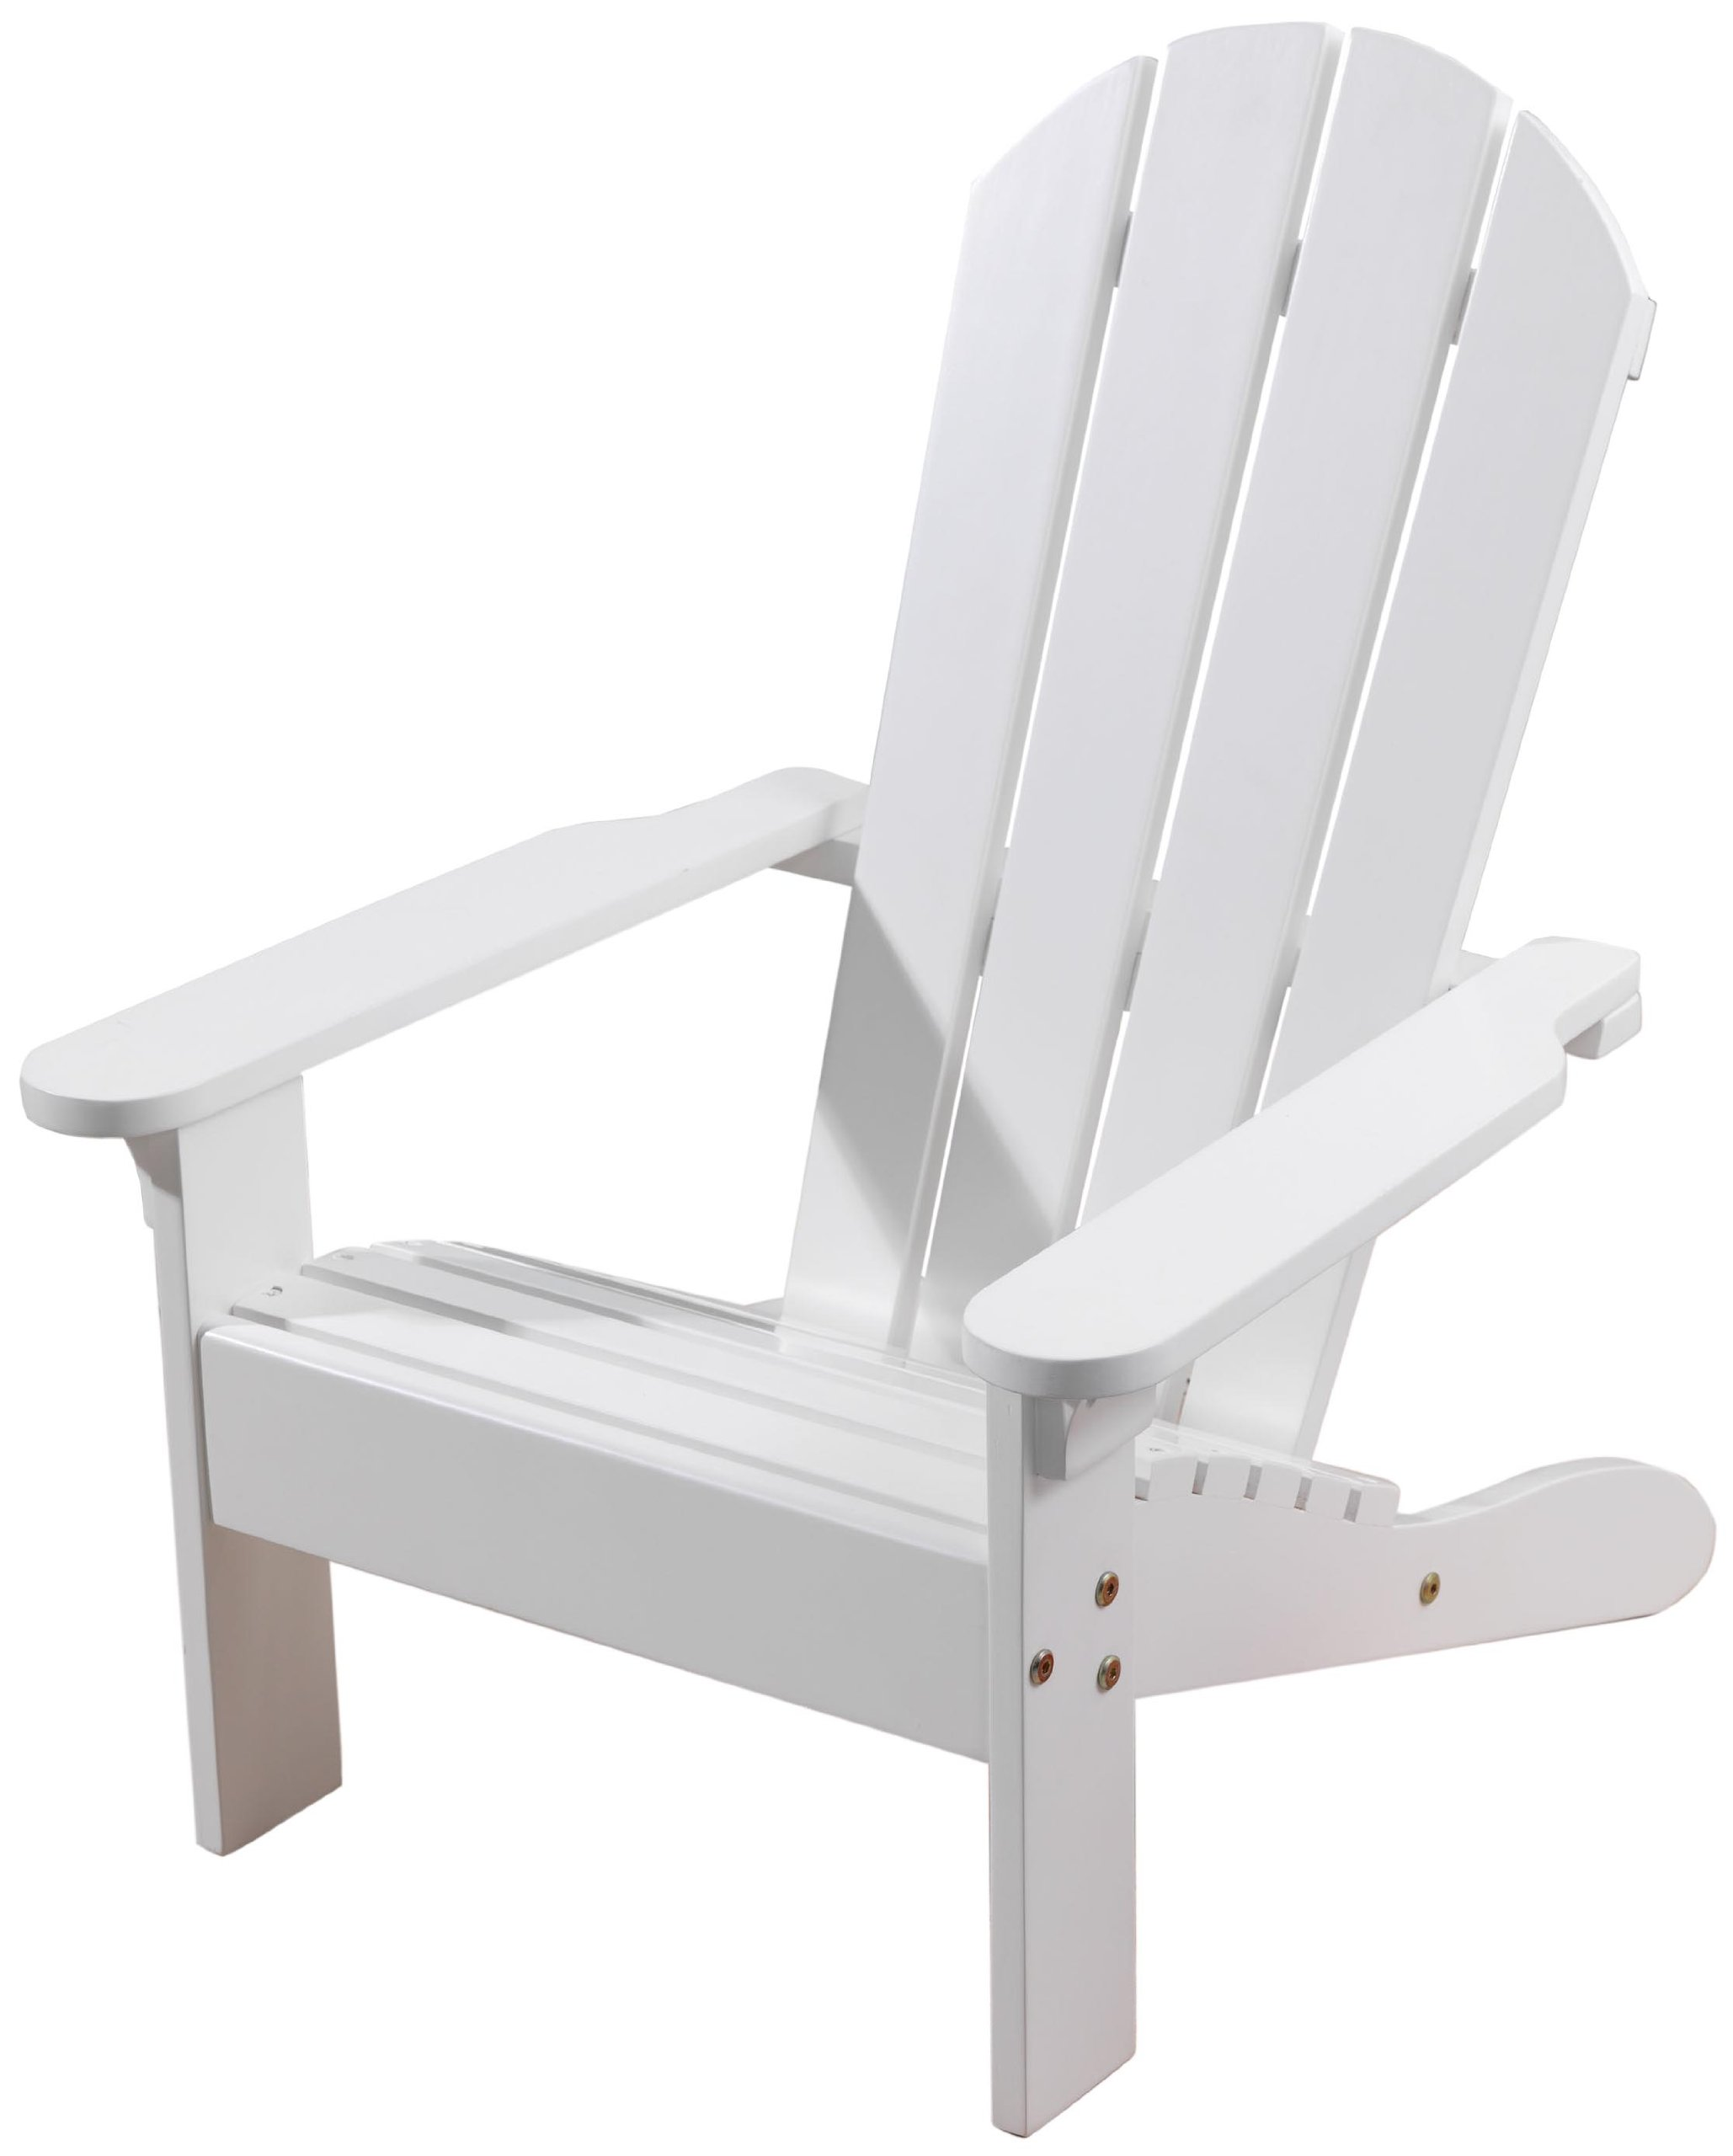 KidKraft Wooden Adirondack Children's Outdoor Chair, Weather-Resistant - White by KidKraft